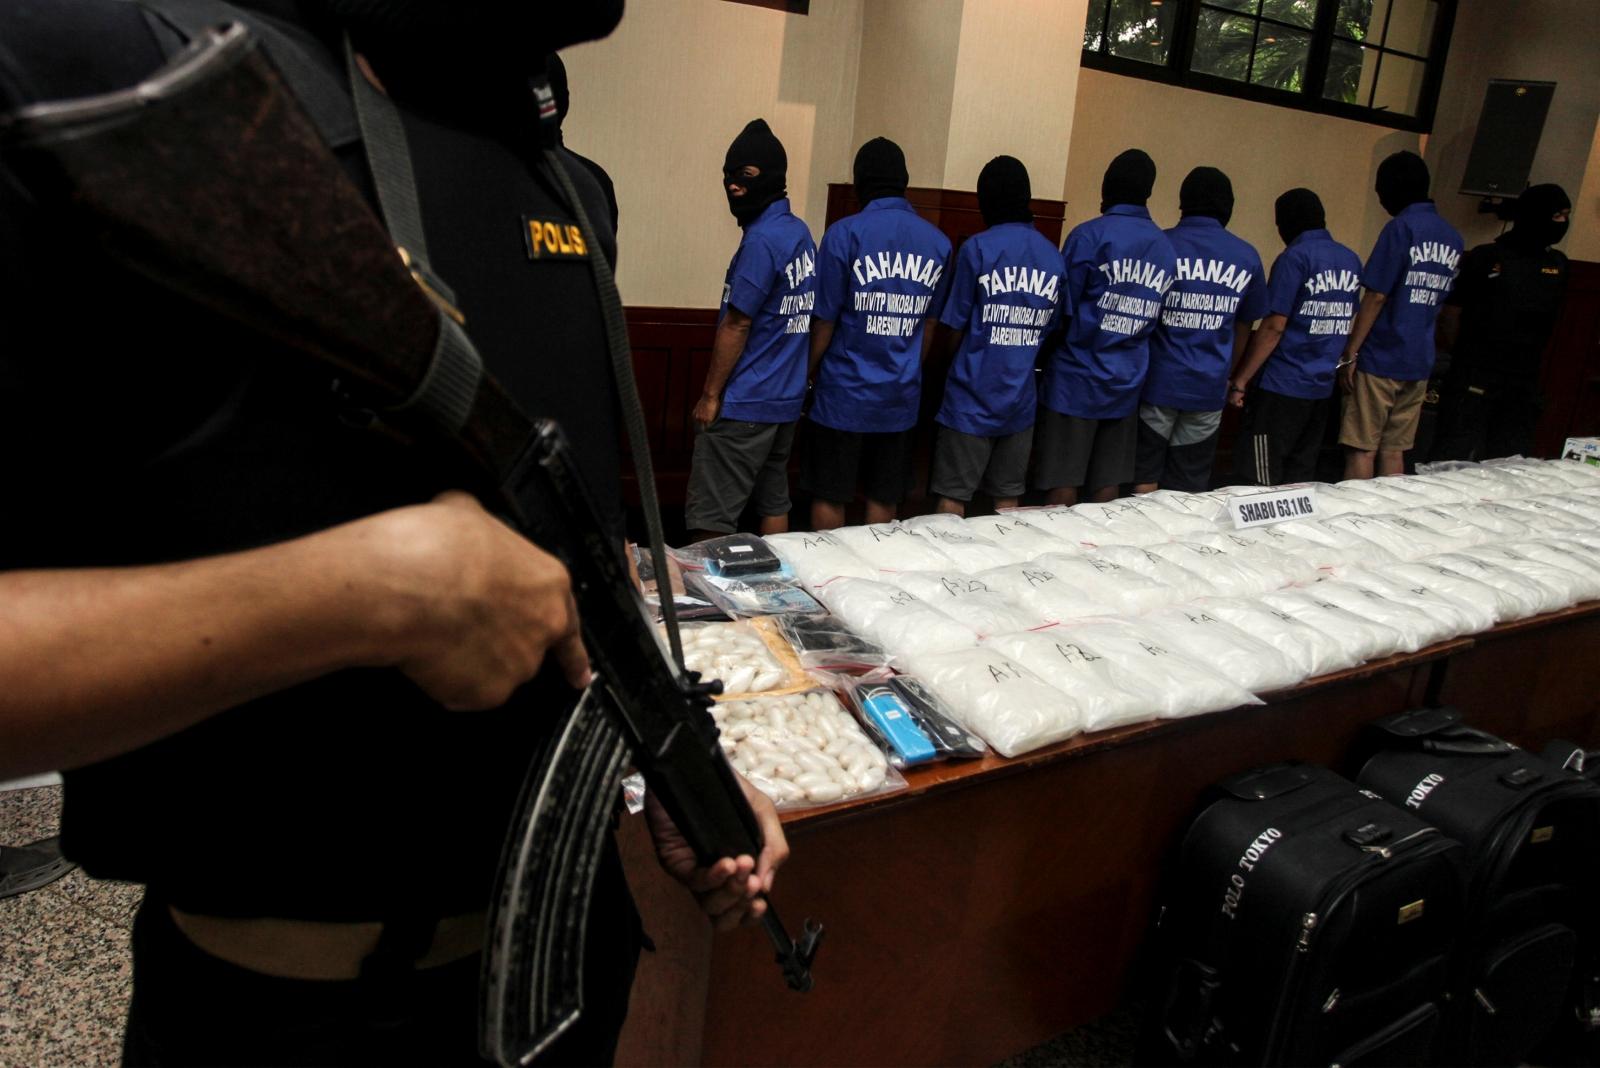 menace of drugs As punjab, manipur, mizoram and assam battle rampant drug abuse among its populace, a leading independent  drug menace, punjab.